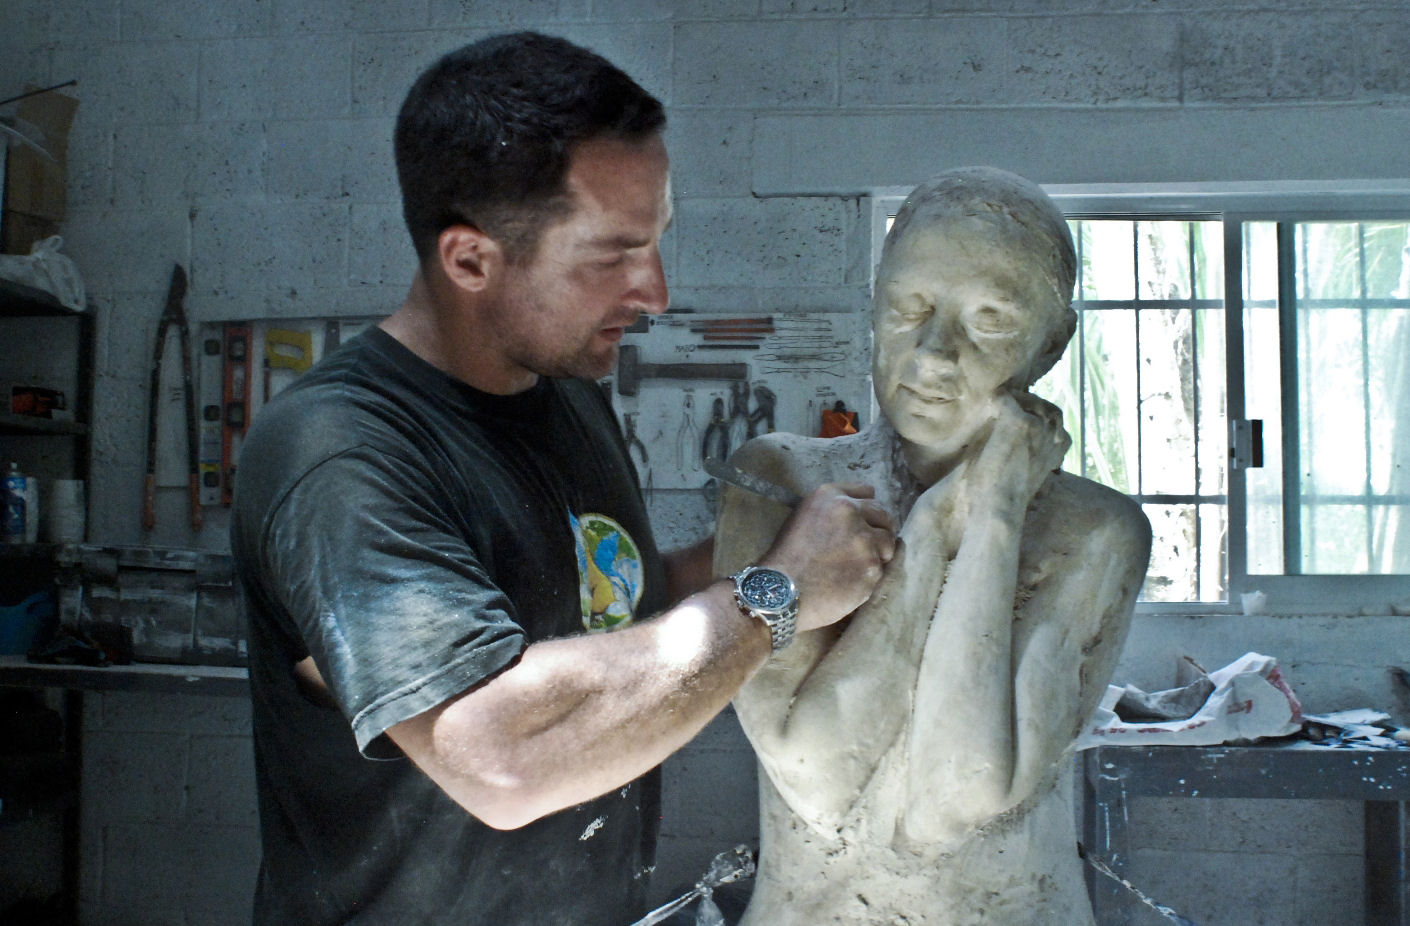 Jason DeCaires Taylor - scultore del museo subacqueo di Lanzarote